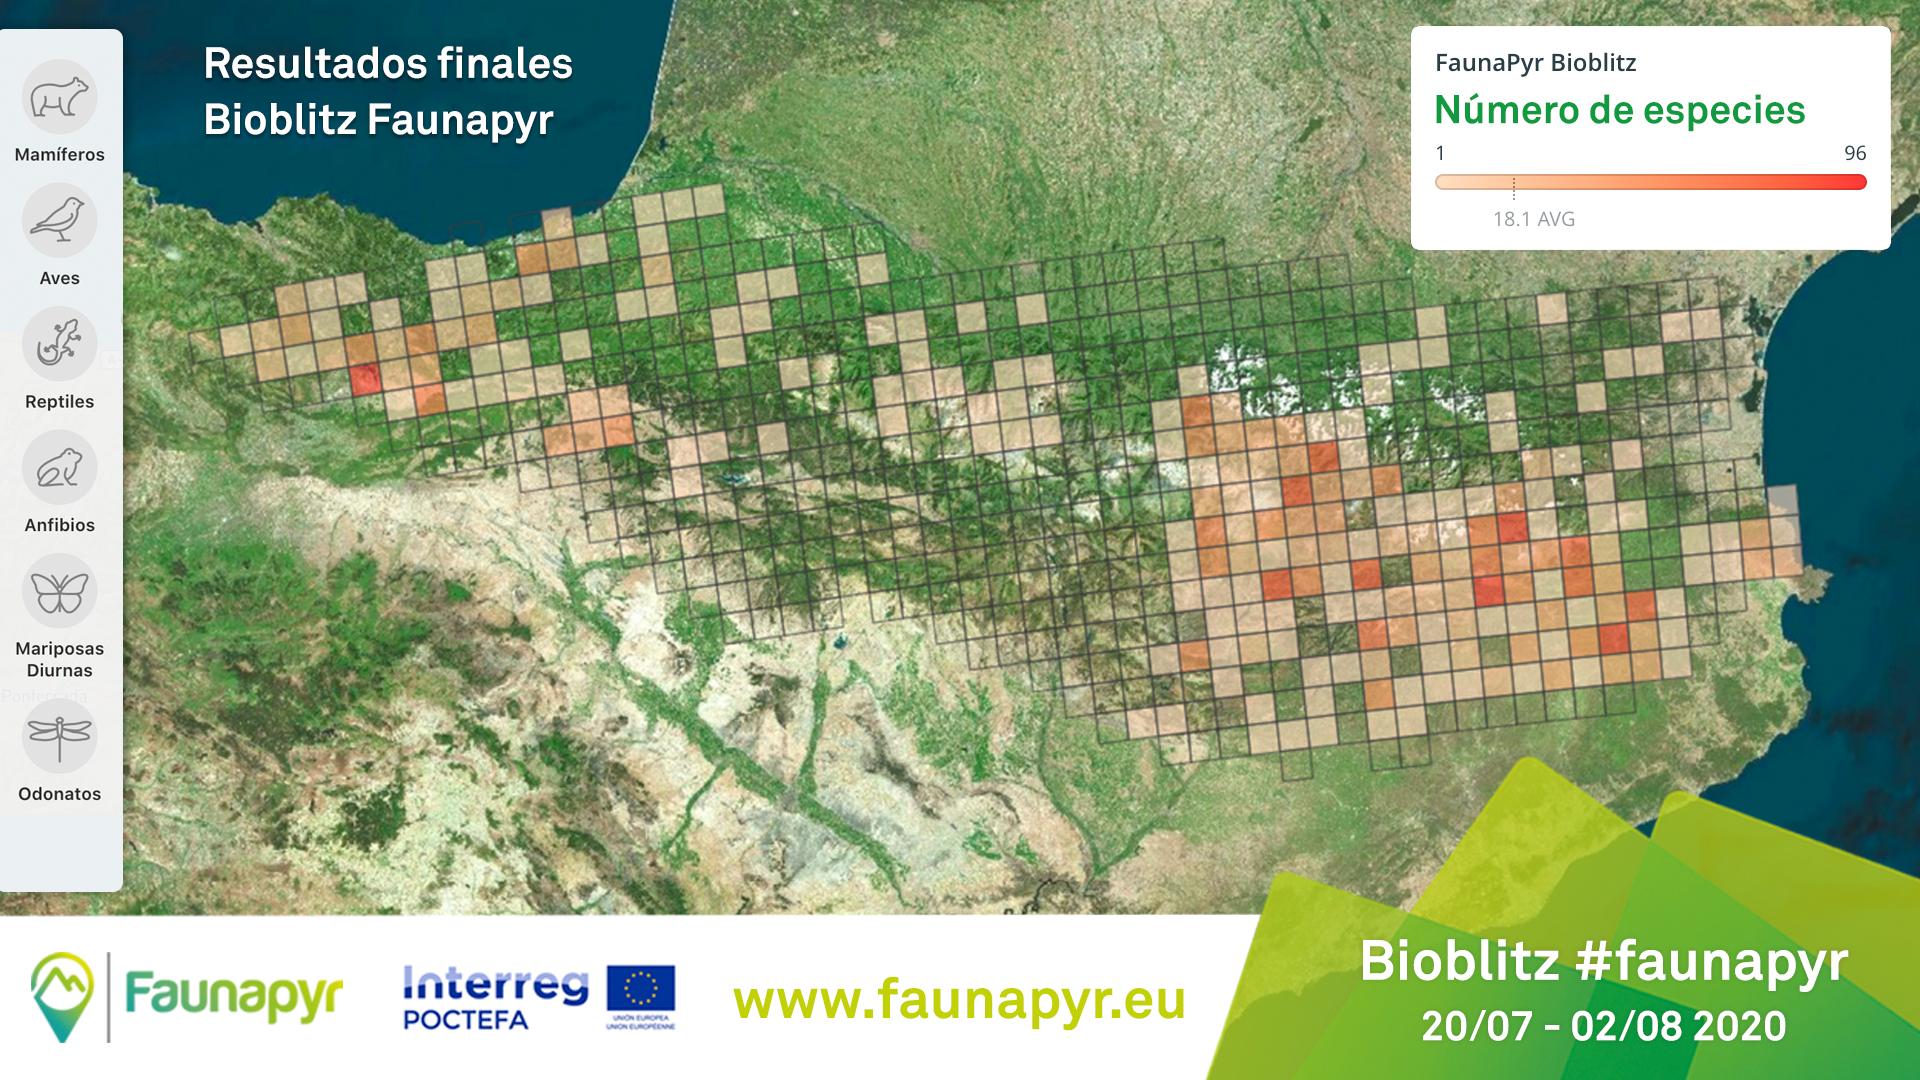 http://files.biolovision.net/www.ornitho.eus/userfiles/ESP-Mapa-especies-Resultados-Bioblitz.jpg